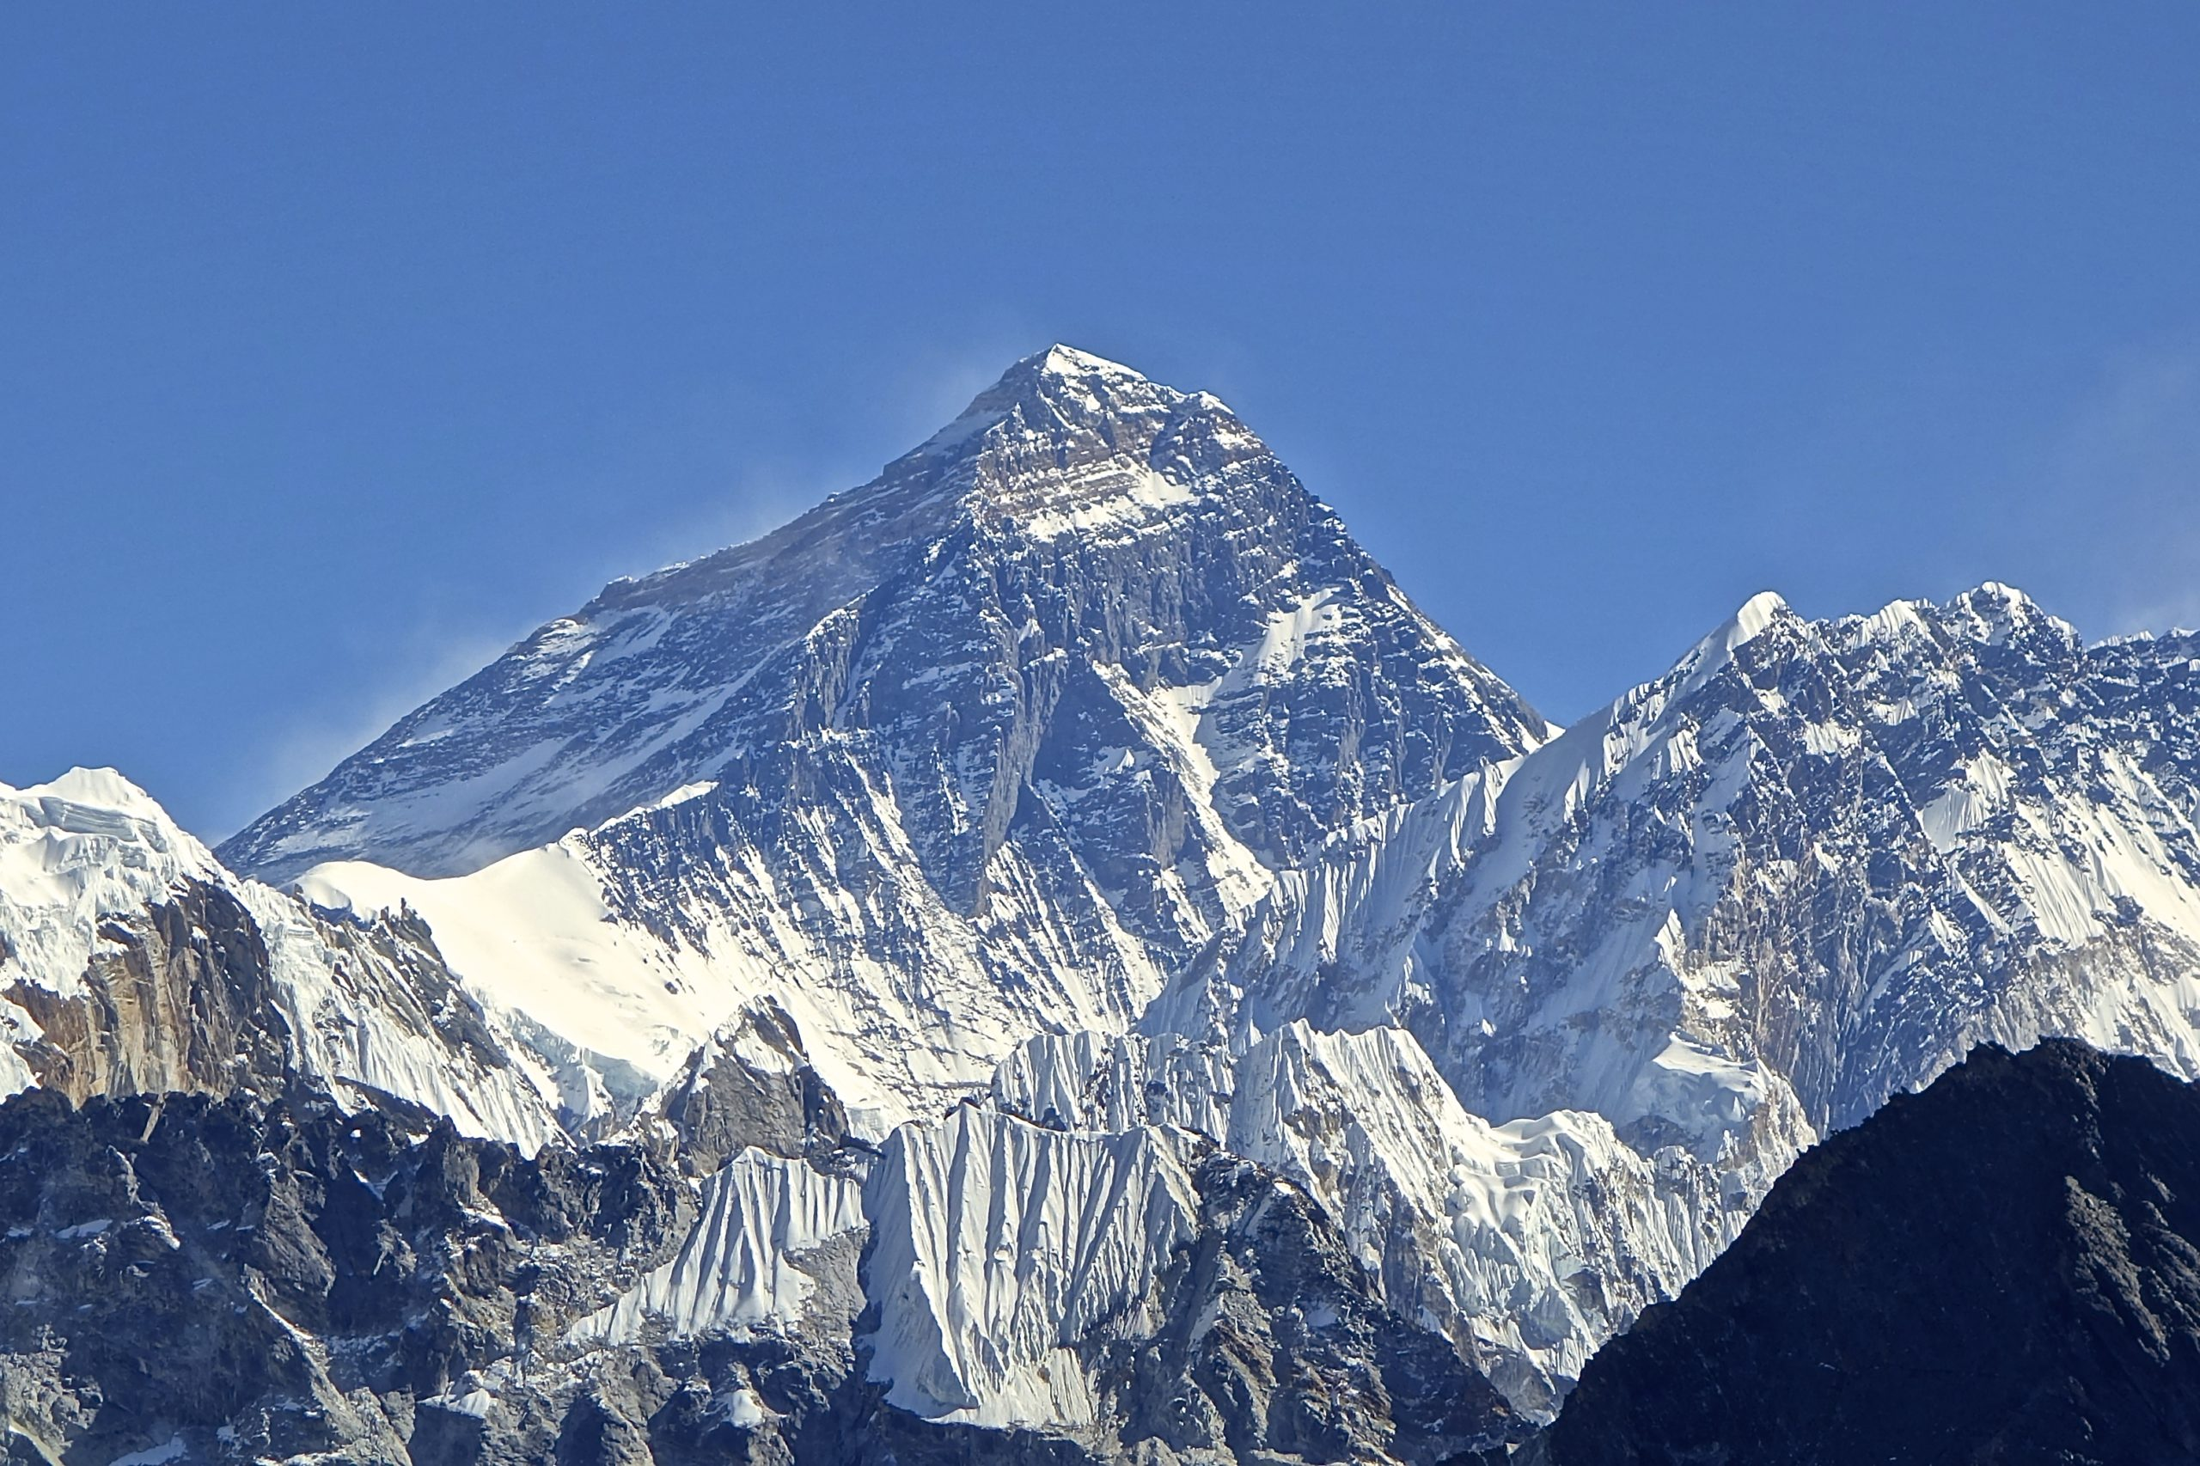 Mt._Everest_from_Gokyo_Ri_November_5,_2012